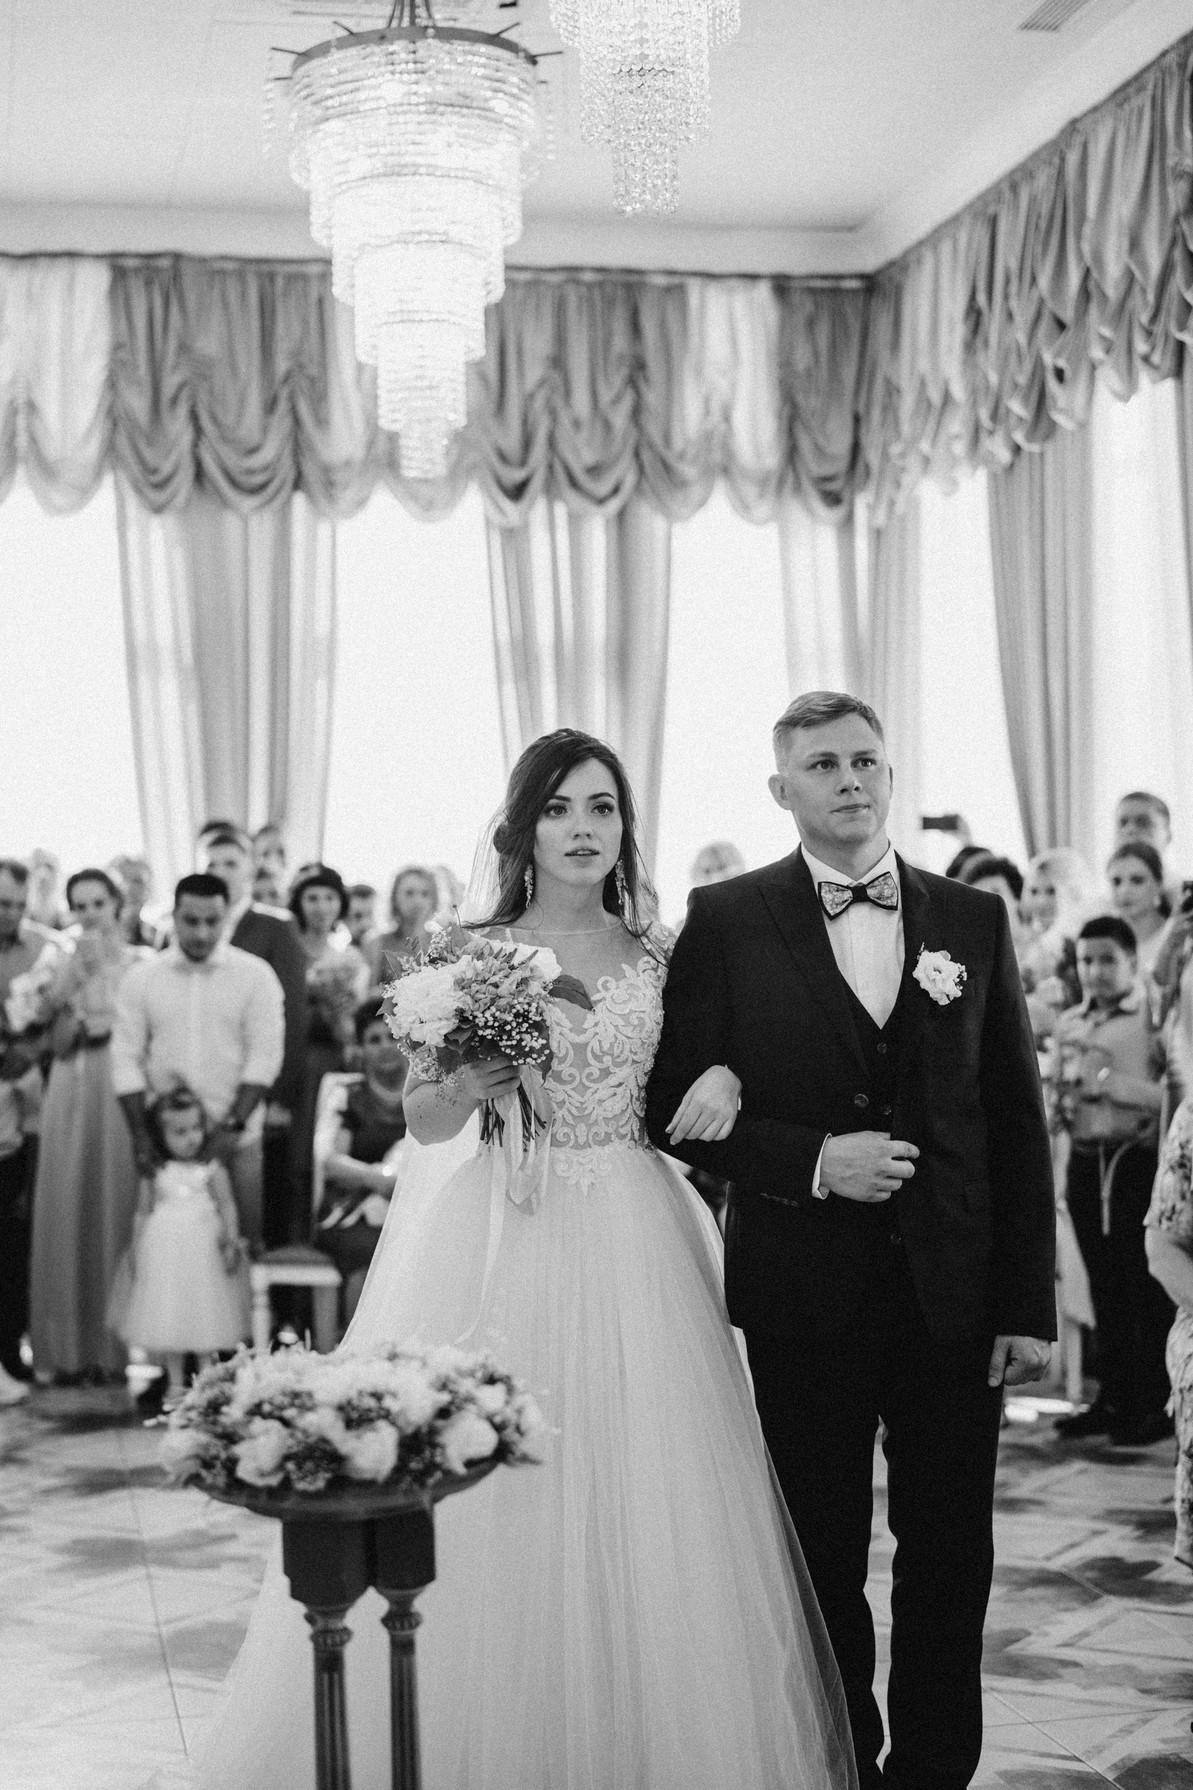 ArtSoul_Wedding_anons-104.jpg